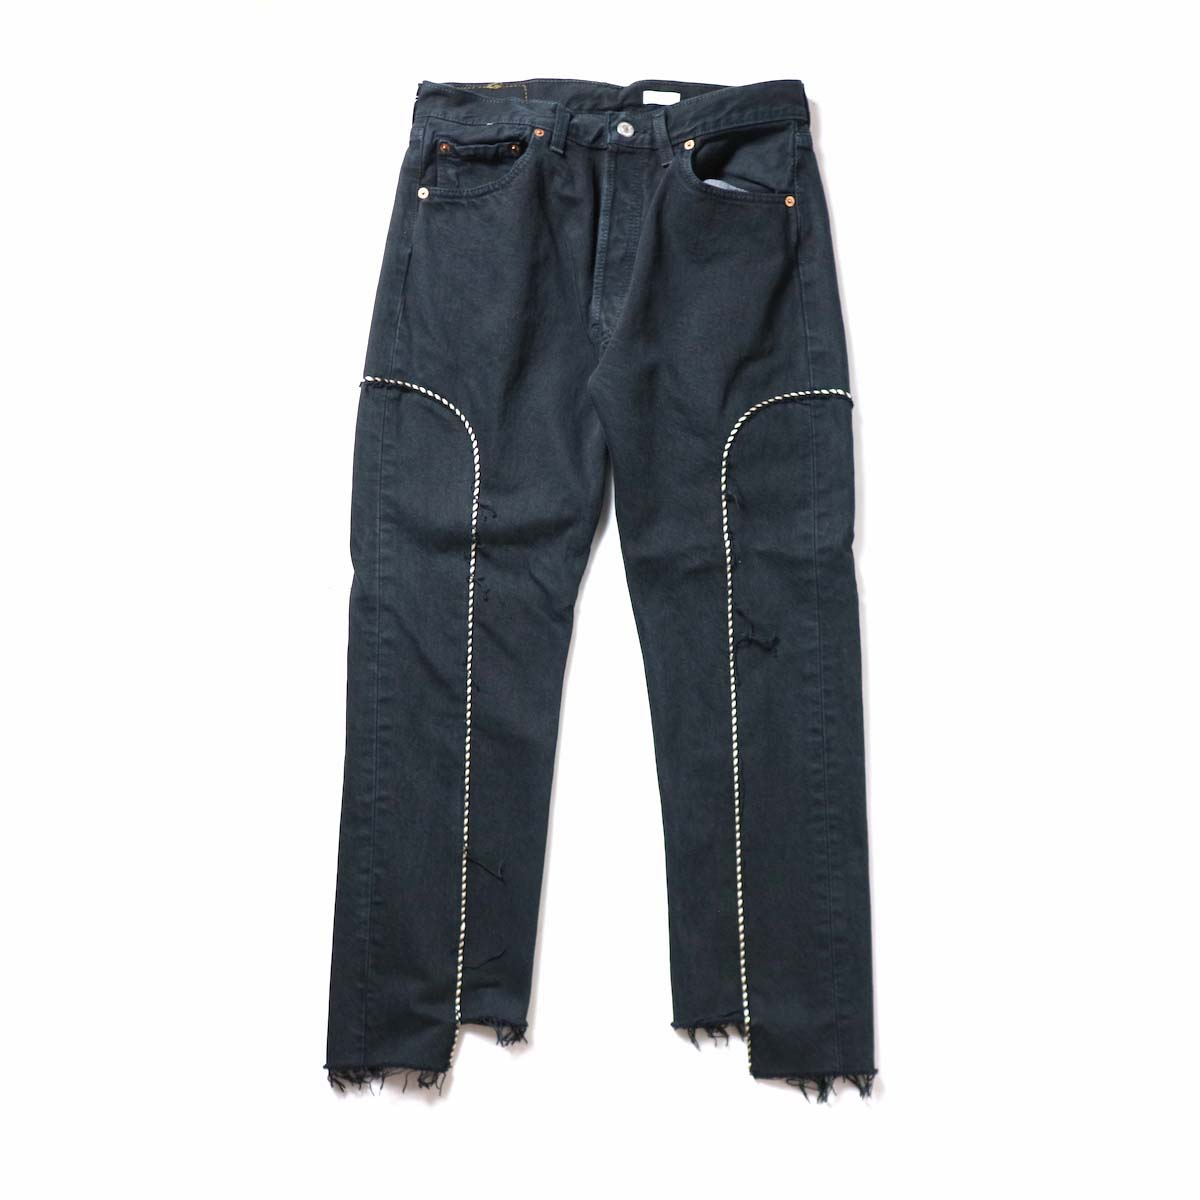 OLD PARK / Western Jeans Black (Msize-F)